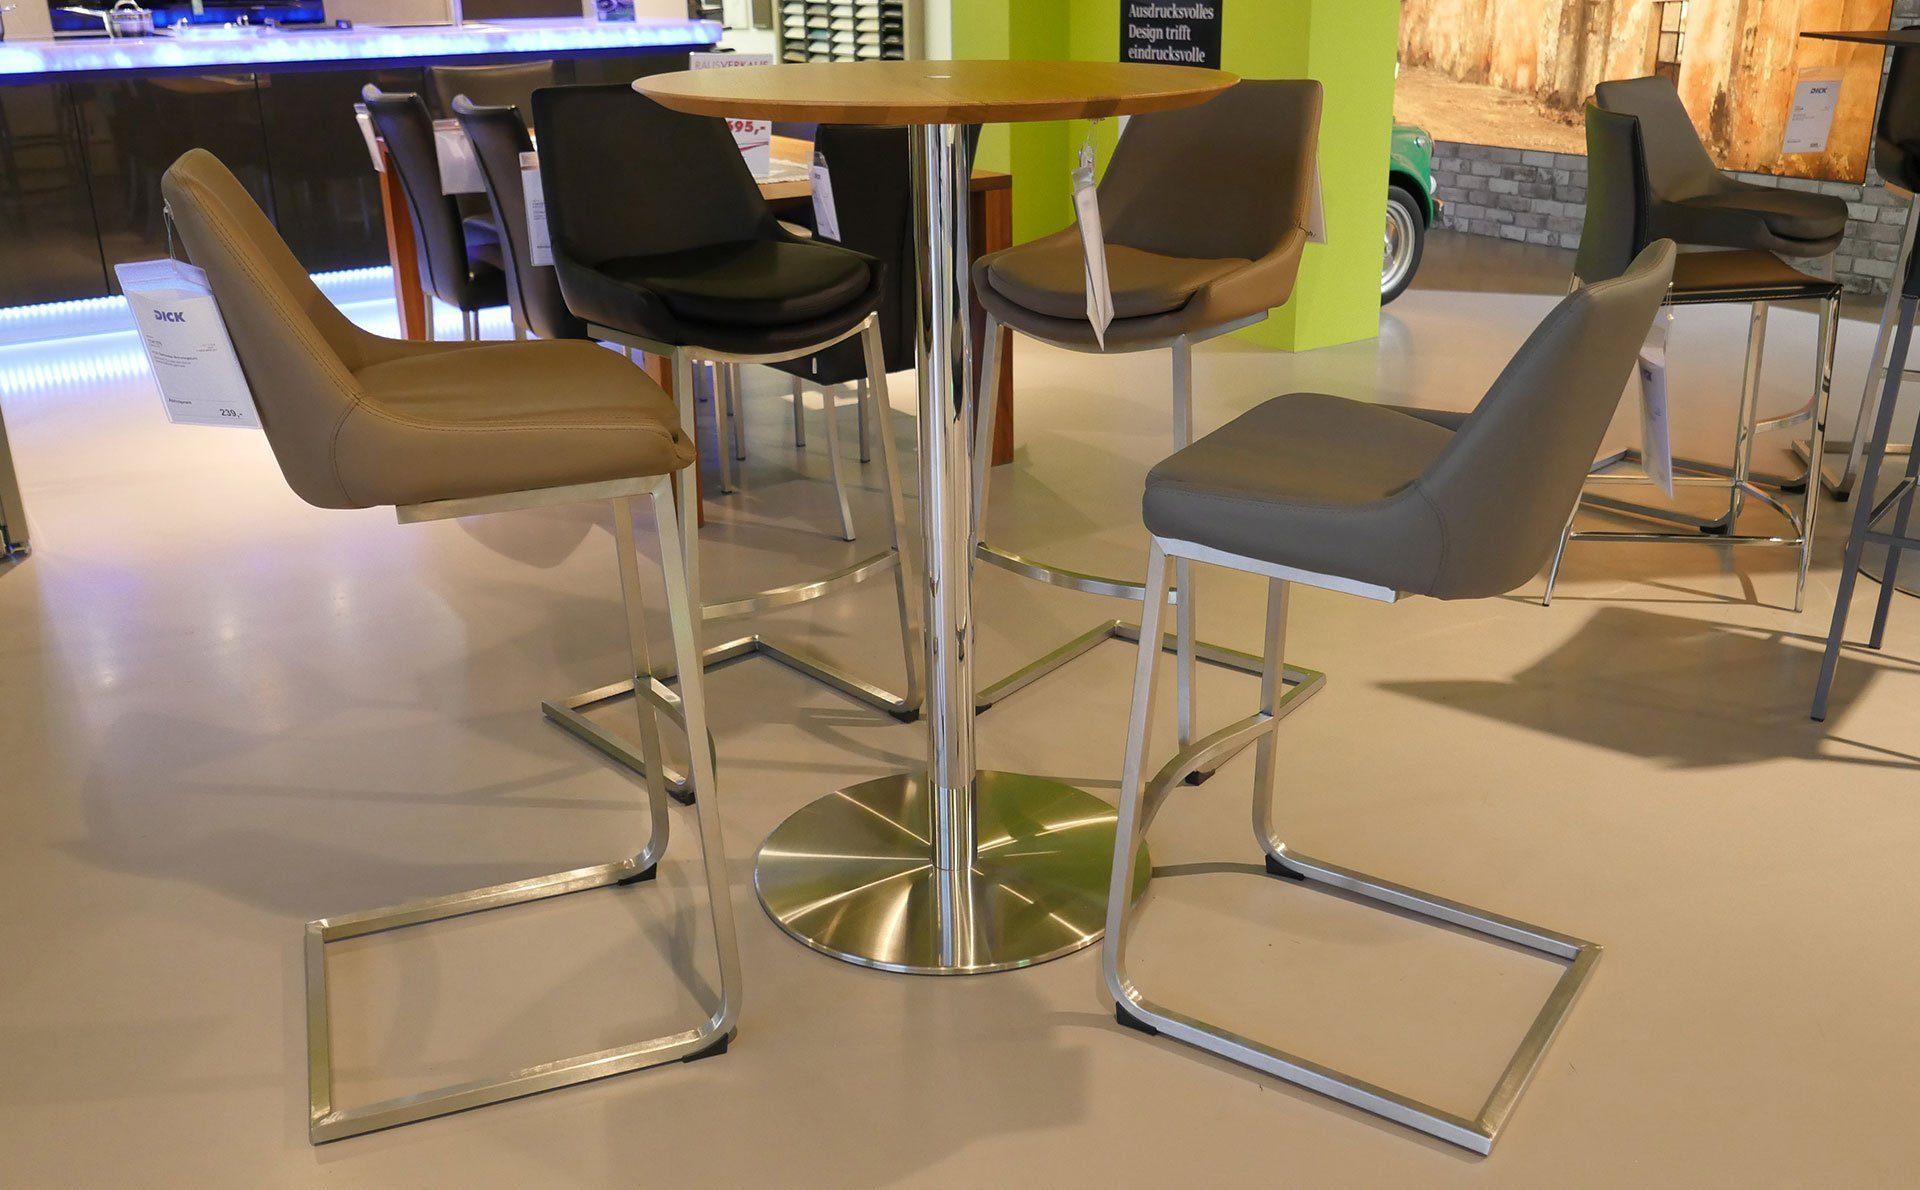 Ronald schmitt design bistrotisch modell p 431 for Design bistrotisch